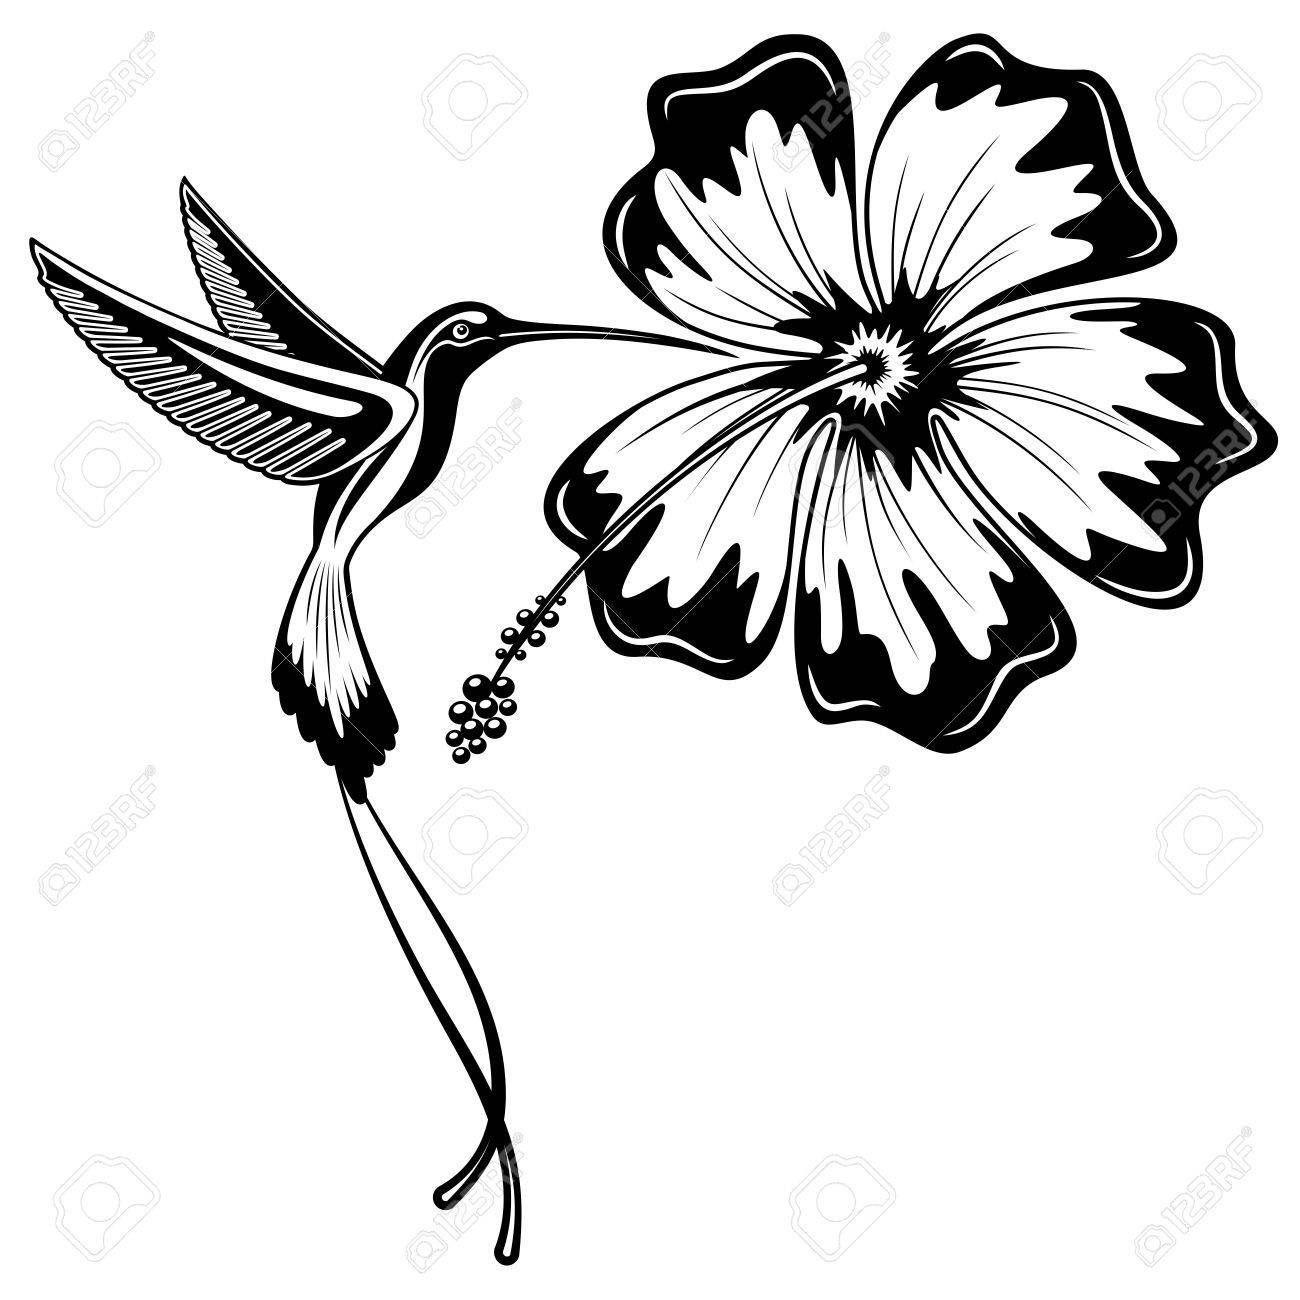 Hummingbird And Hibiscus Tattoo Hibiscus Tattoo Hummingbird Tattoo Hummingbird Drawing